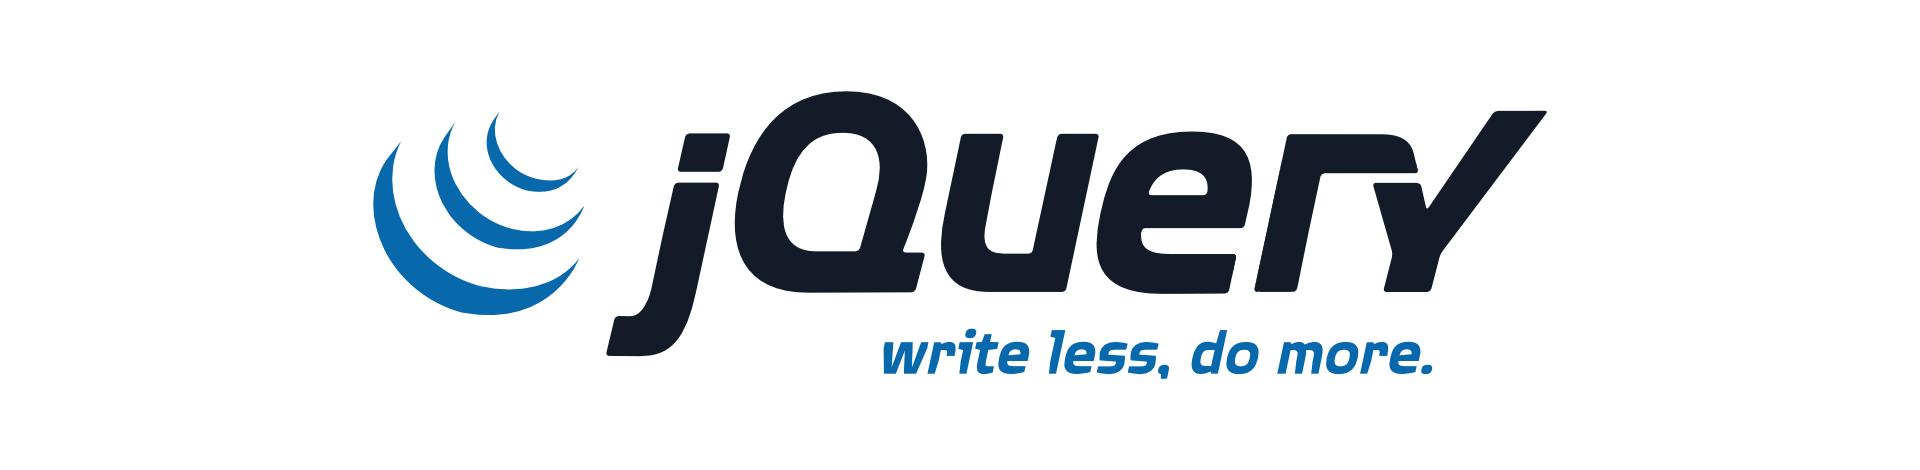 【jQuery】同一クラスを別々に処理させる為に個人的に覚えておきたいこと